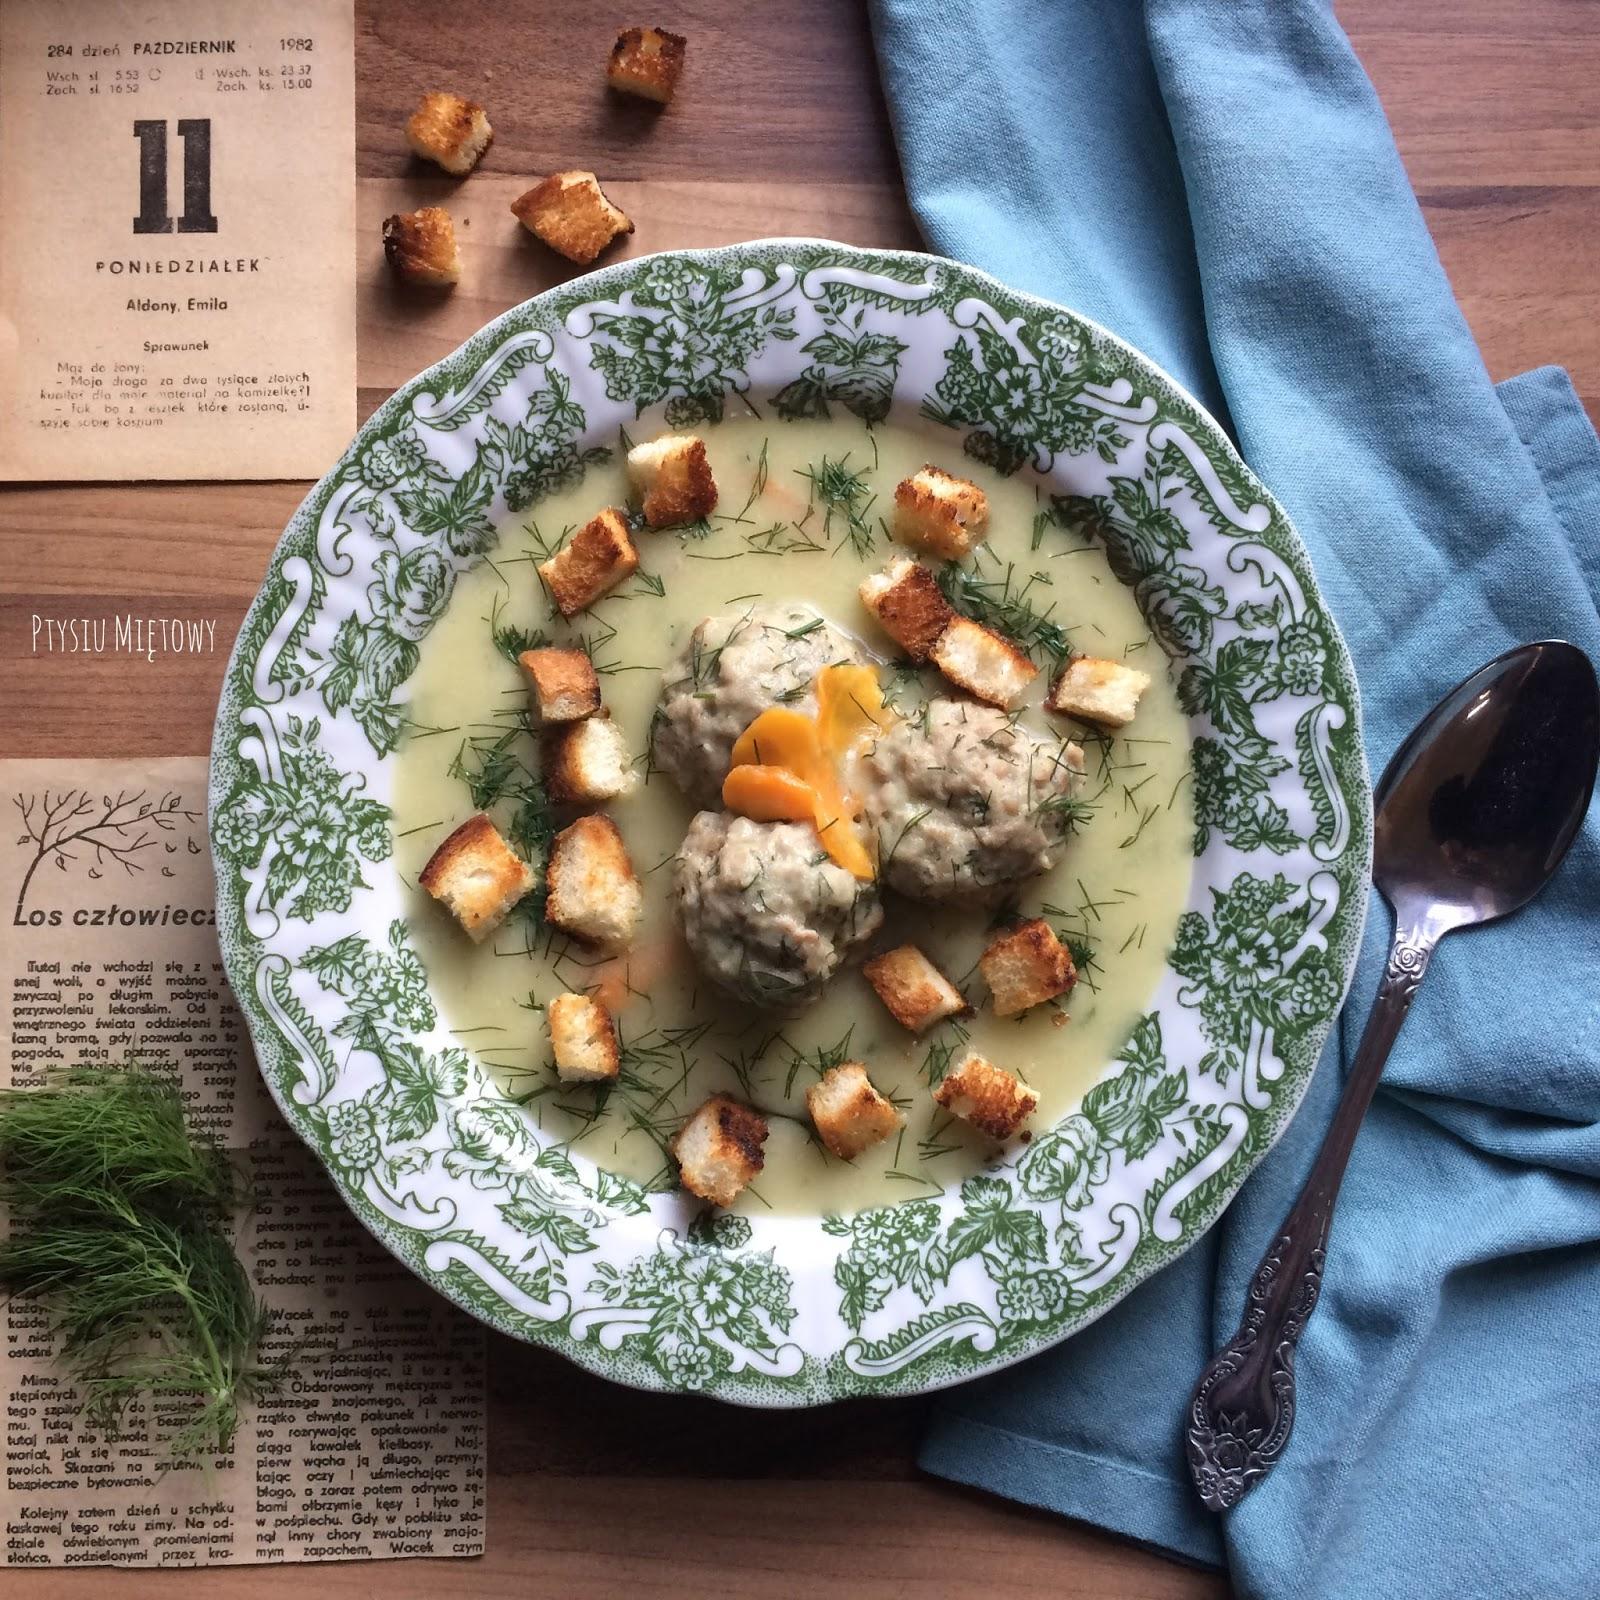 zupa klopsikowa, ptysiu mietowy